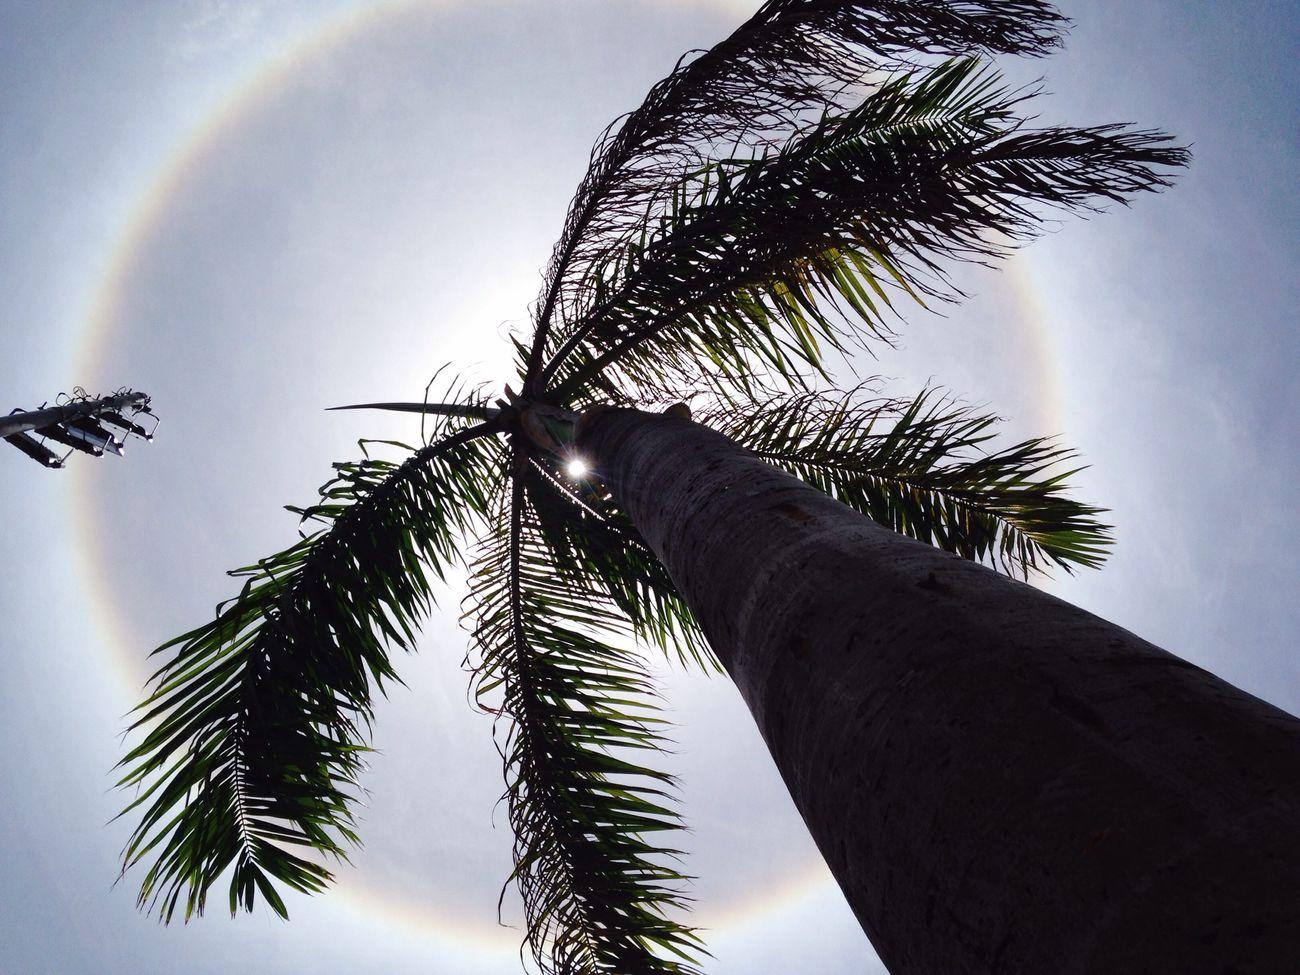 Halo Solar! Halo Recife Meulugar FenômenoAtmosférico Geografia VemComSol